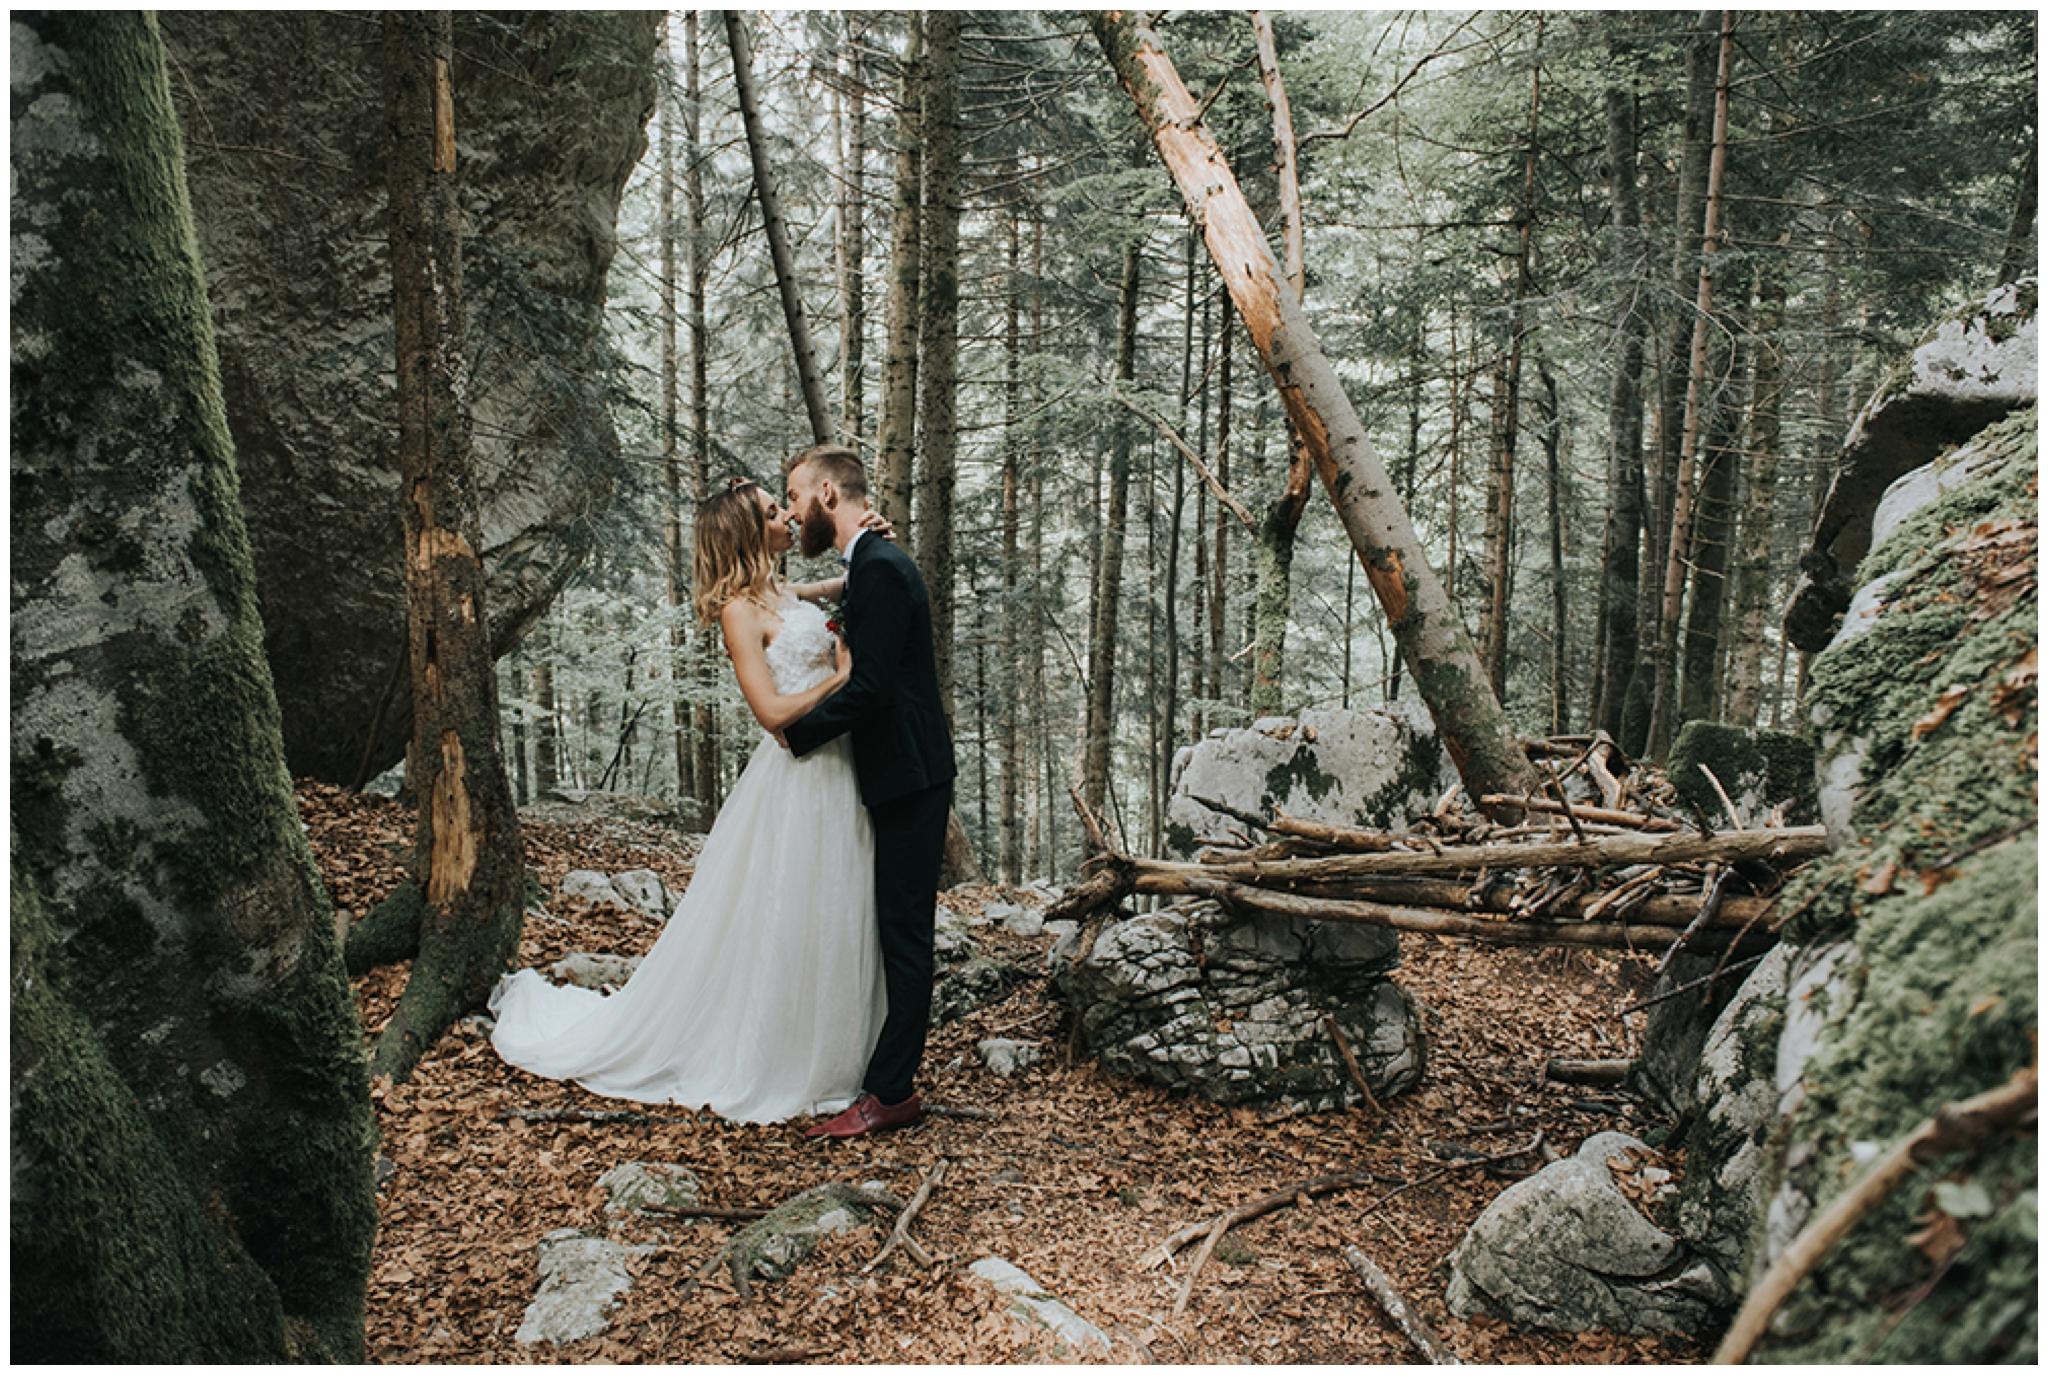 photographe-mariage-grenoble-annecy-lyon-shooting-inspiration-boheme-023